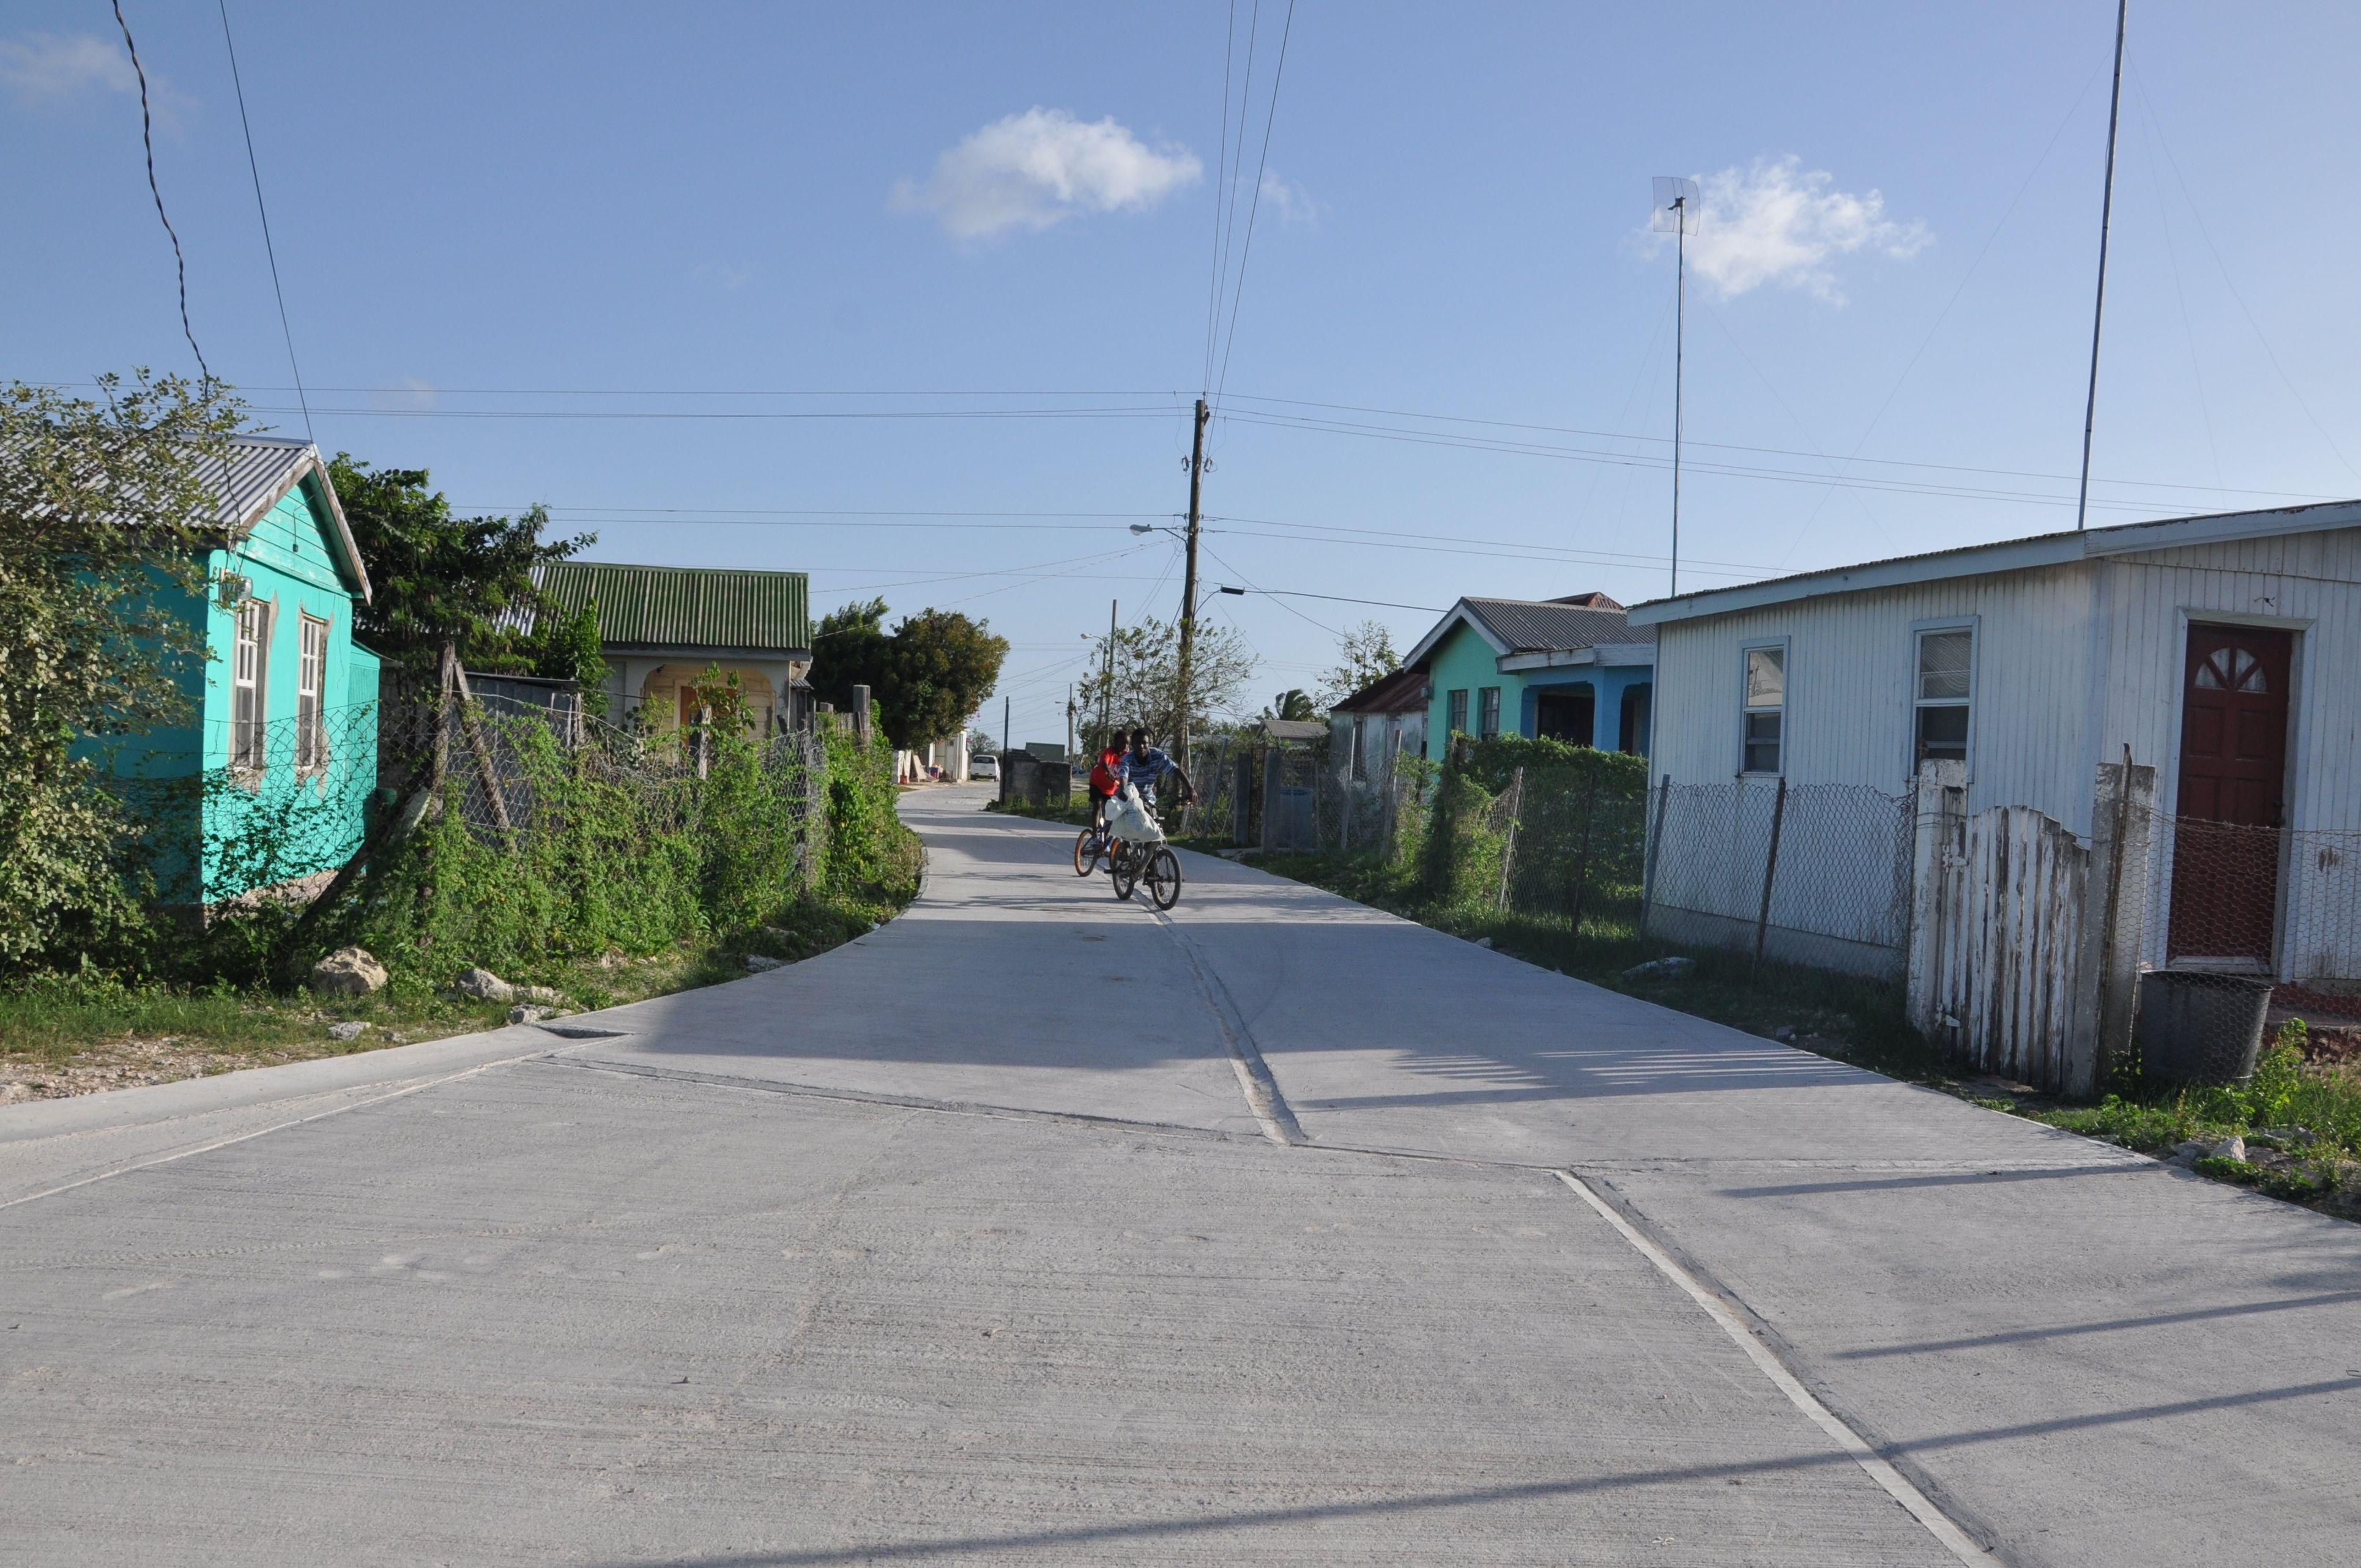 Barbuda (17-19.03)